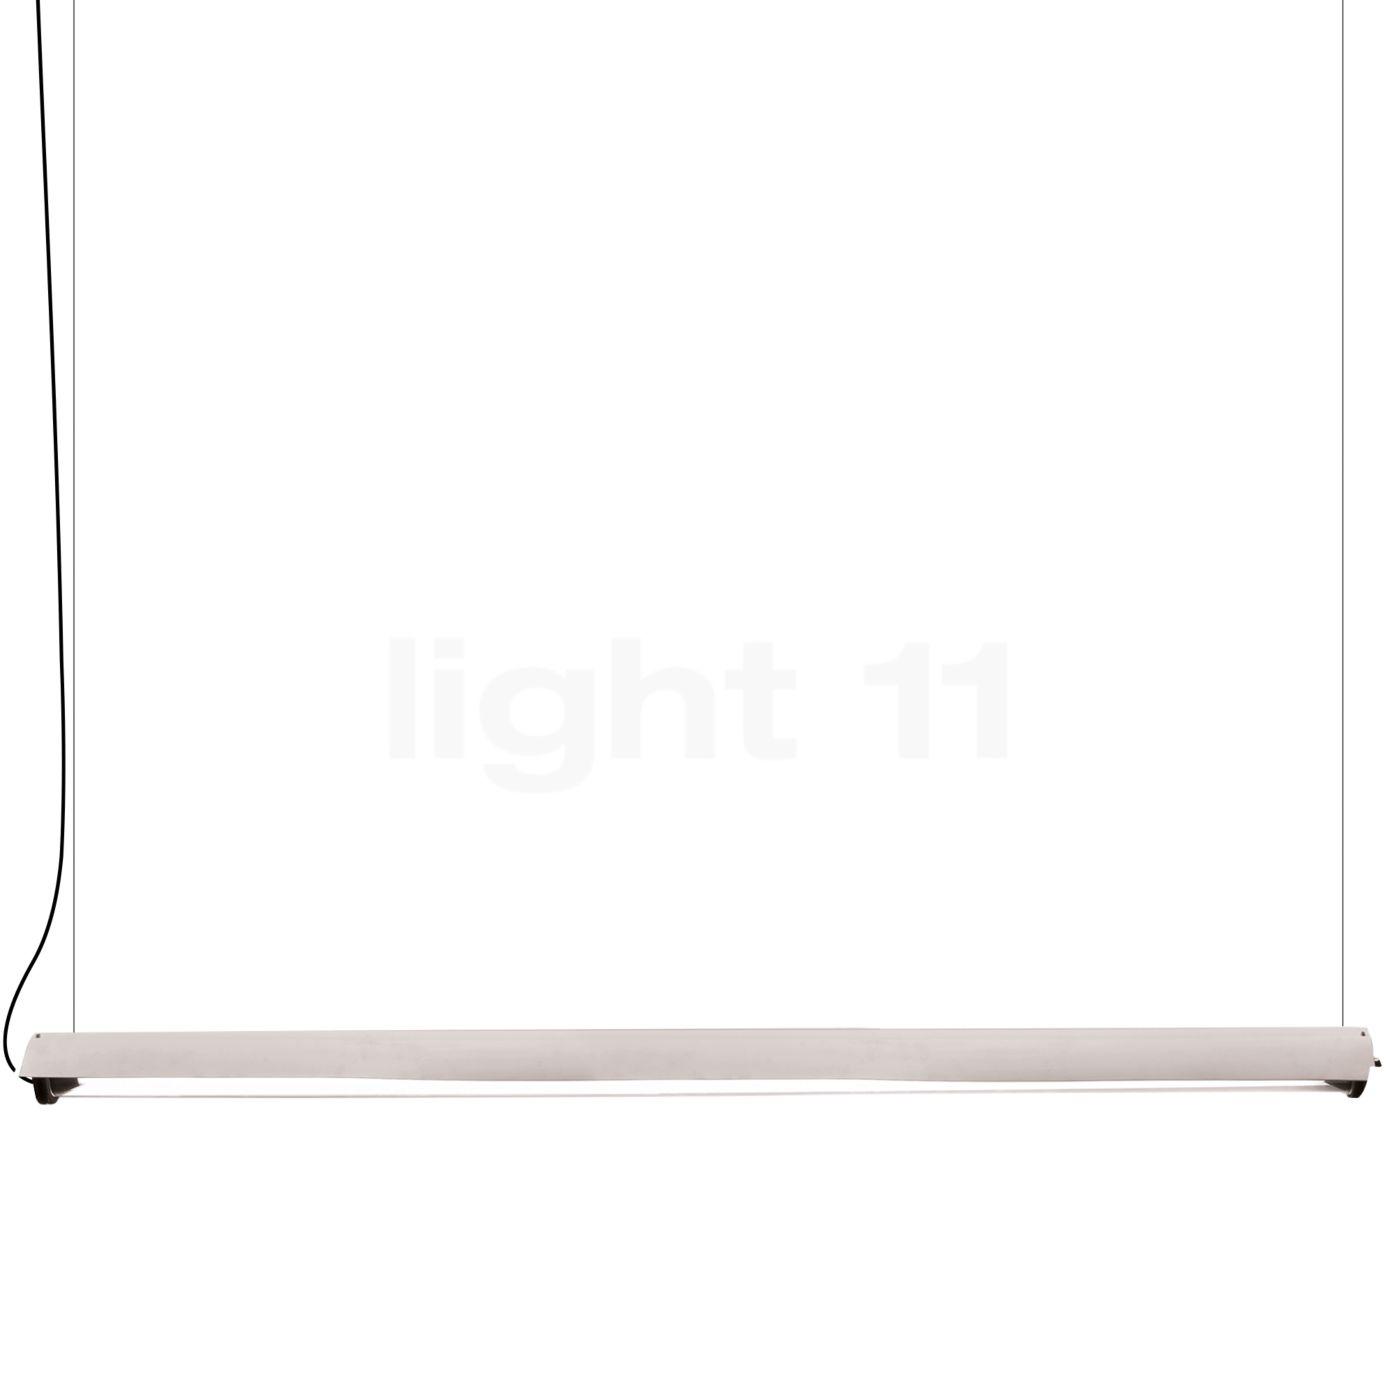 DCW In The Tube 360° - 1600 Suspension LED avec FLAP, volet blanc/sans maille